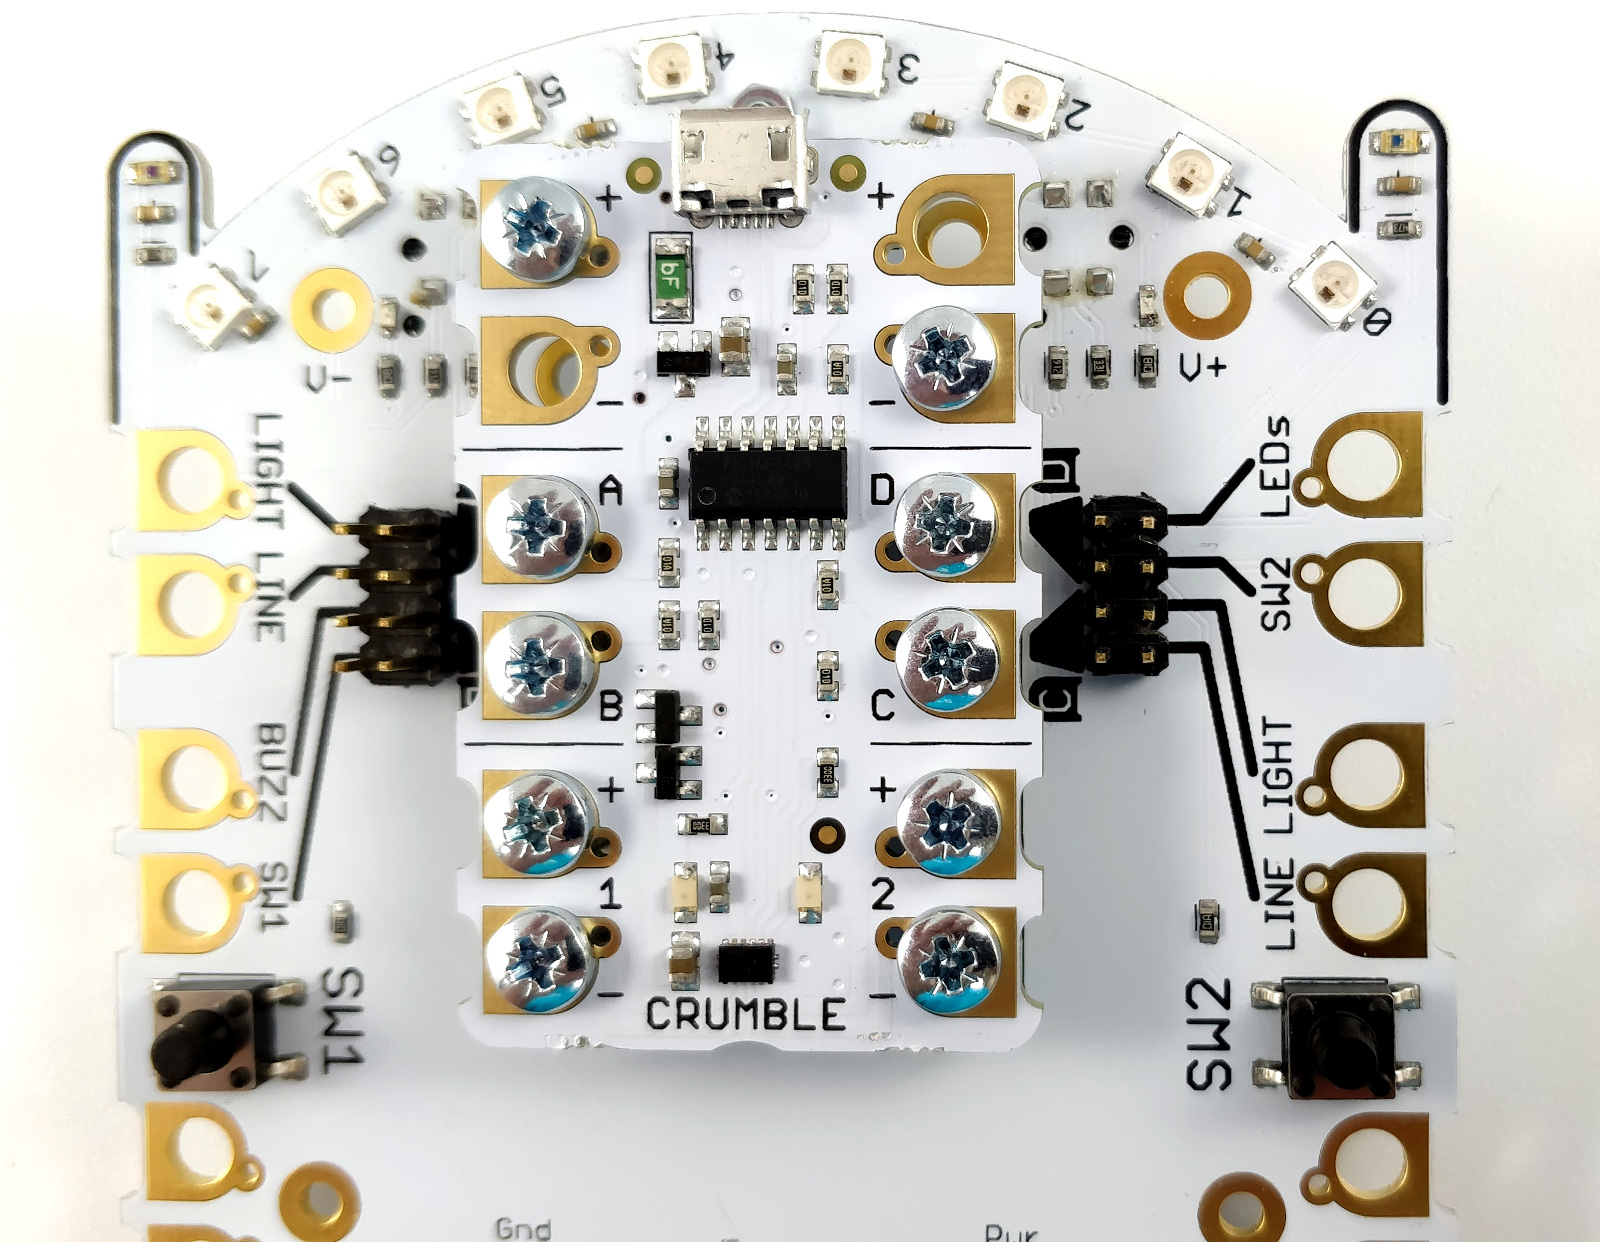 CrumbleBot2_06_1600